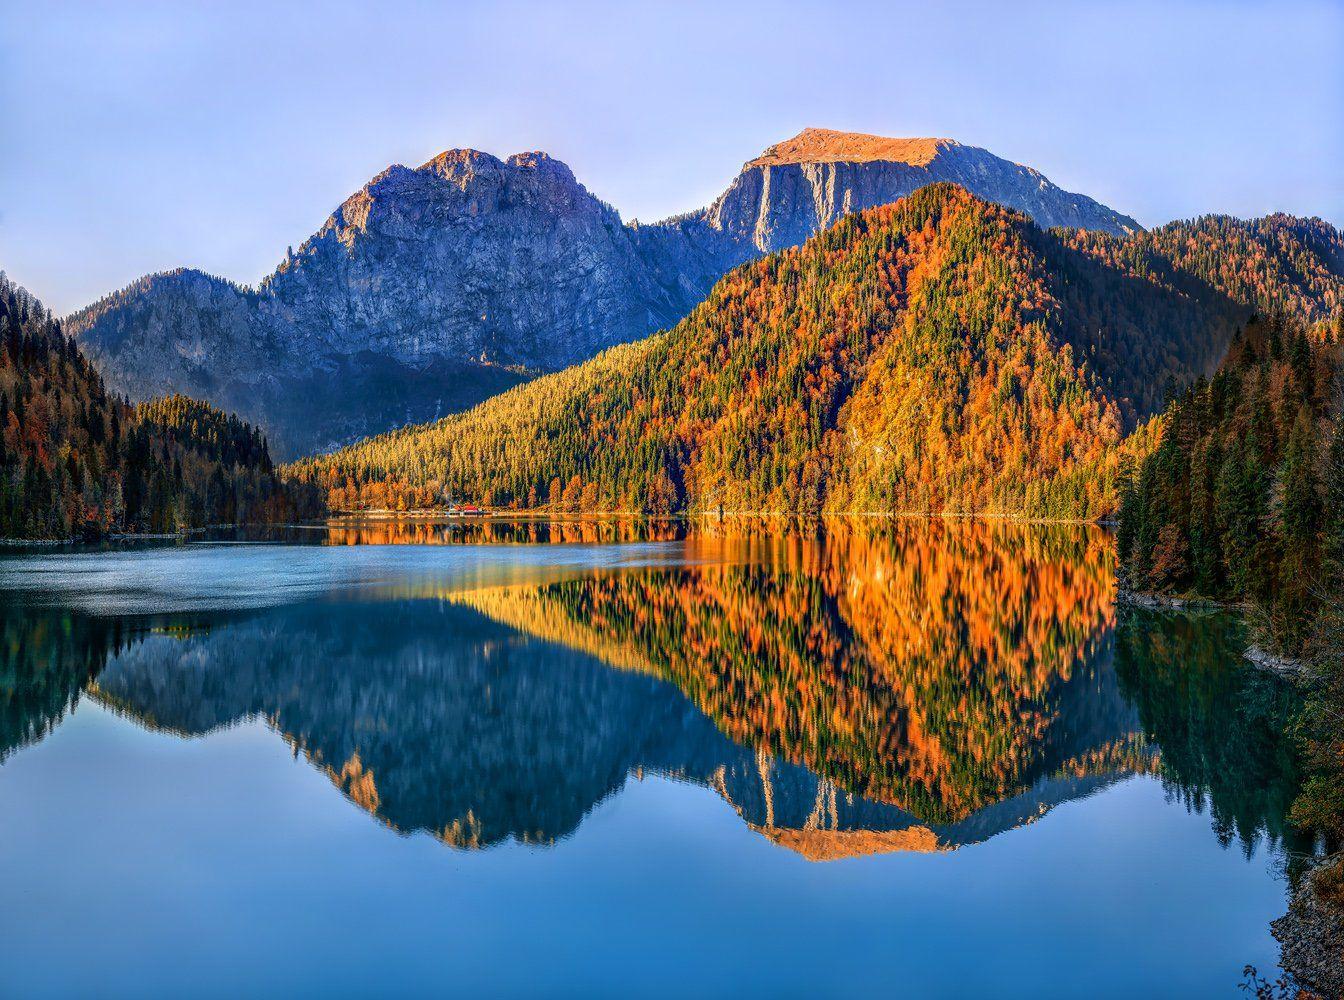 Абхазия, Горы, Лес, Озеро, Осень, Рица, Лашков Фёдор